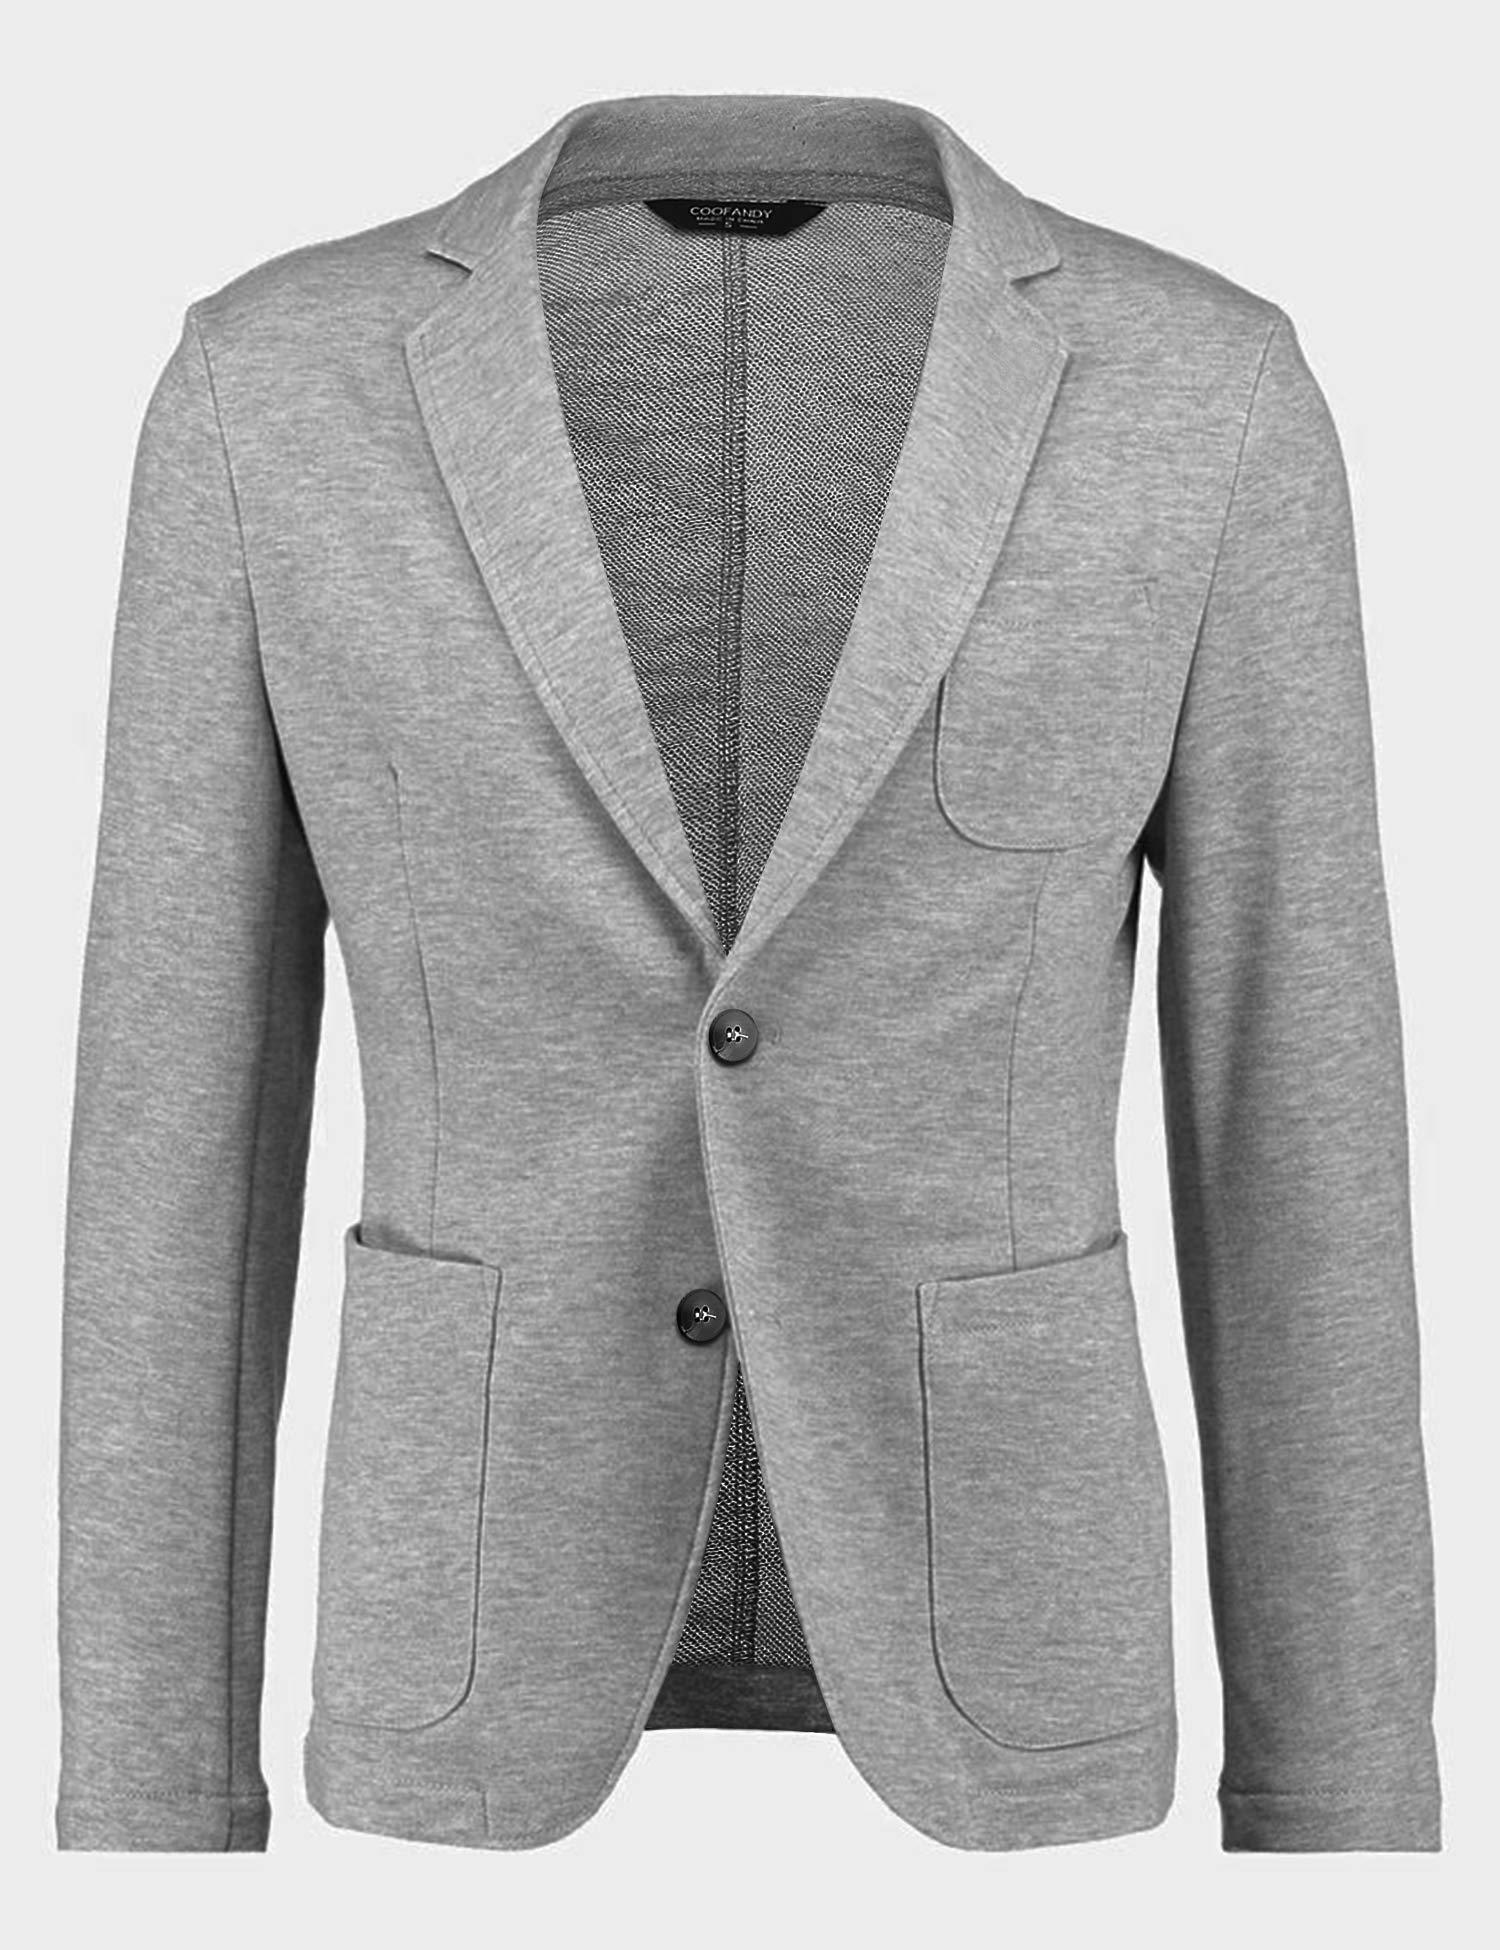 JINIDU Men's Blazer Jacket Casual Two Button Notched Lapel Lightweight Blazer Coat